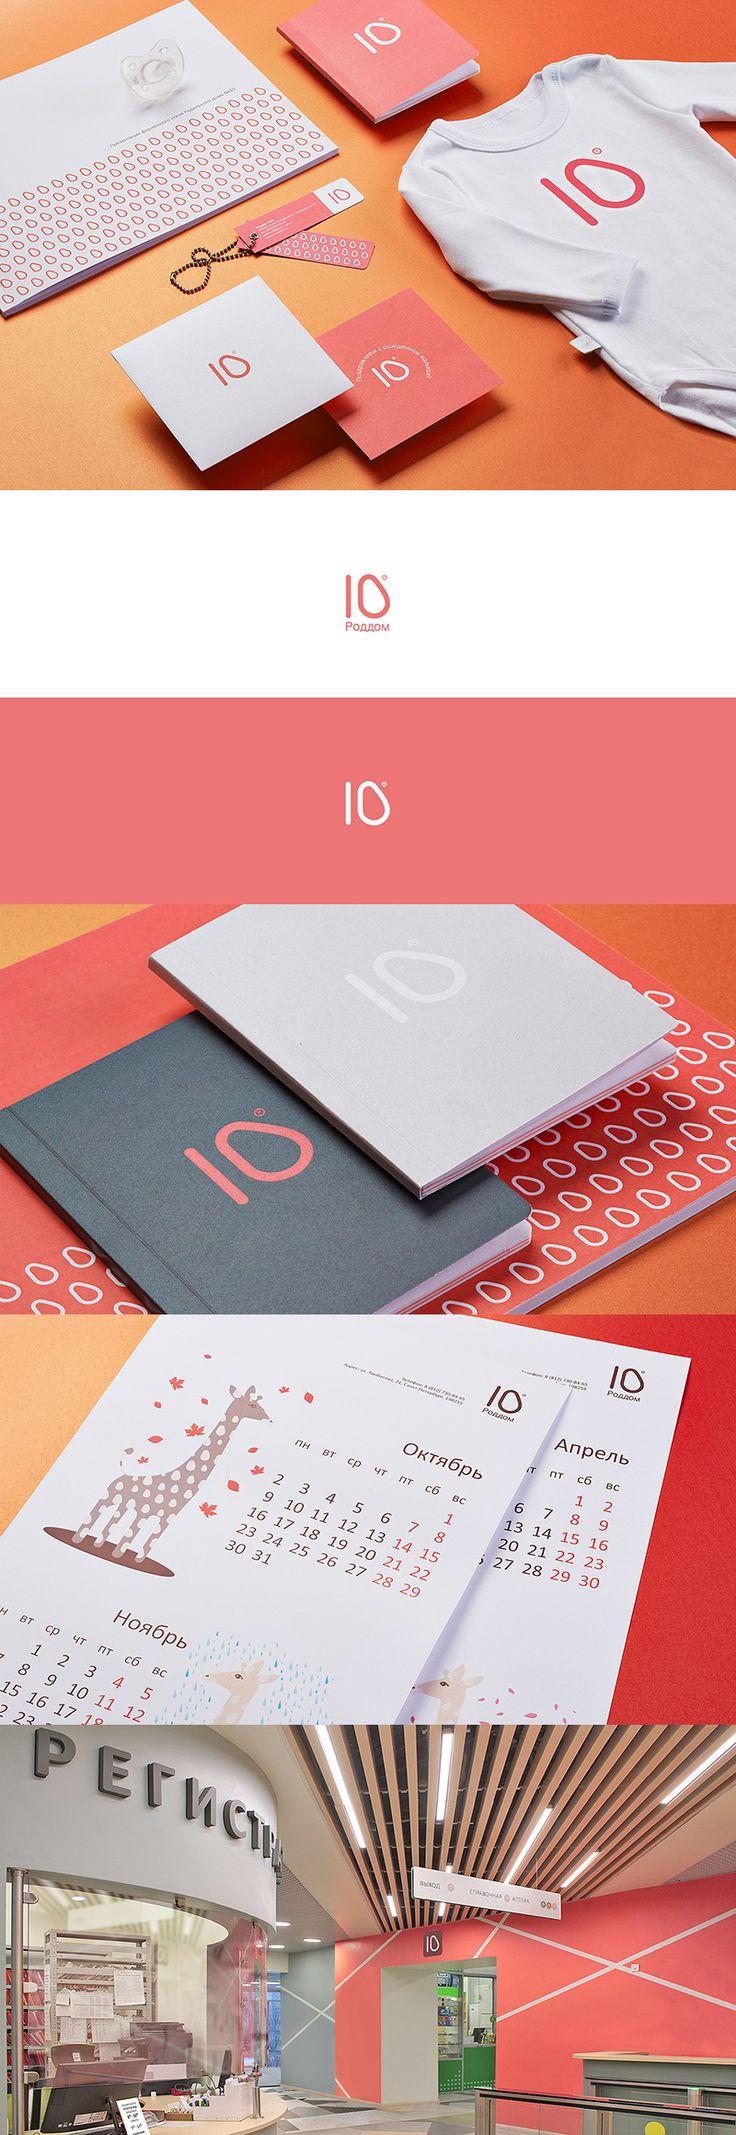 Maternity Hospital 10 by Goryanin Brothers #medicalbrand #branding #brandinginspiration